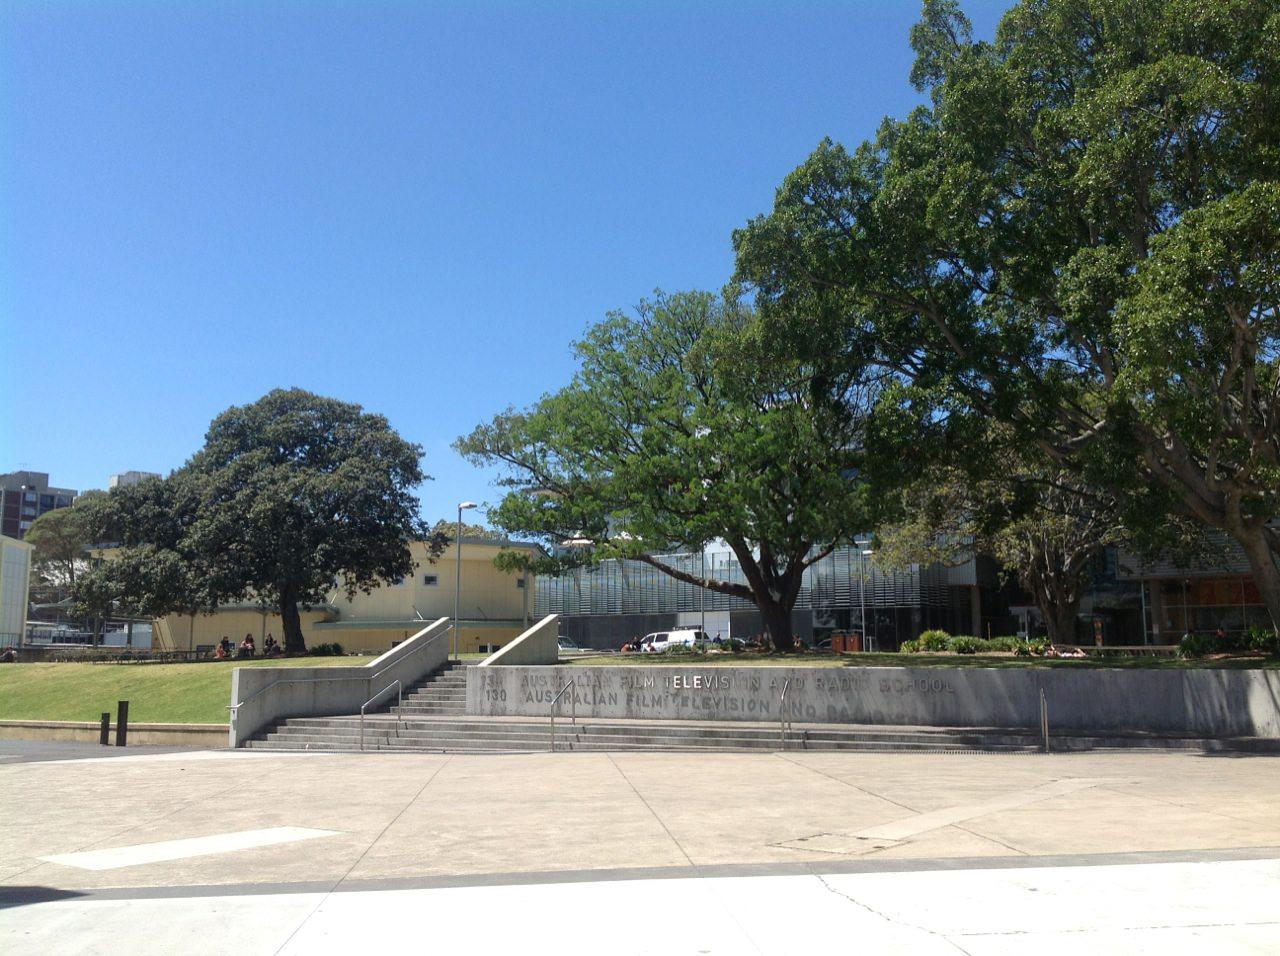 Hill's Fig, Port Jackson Fig and Podocarpus